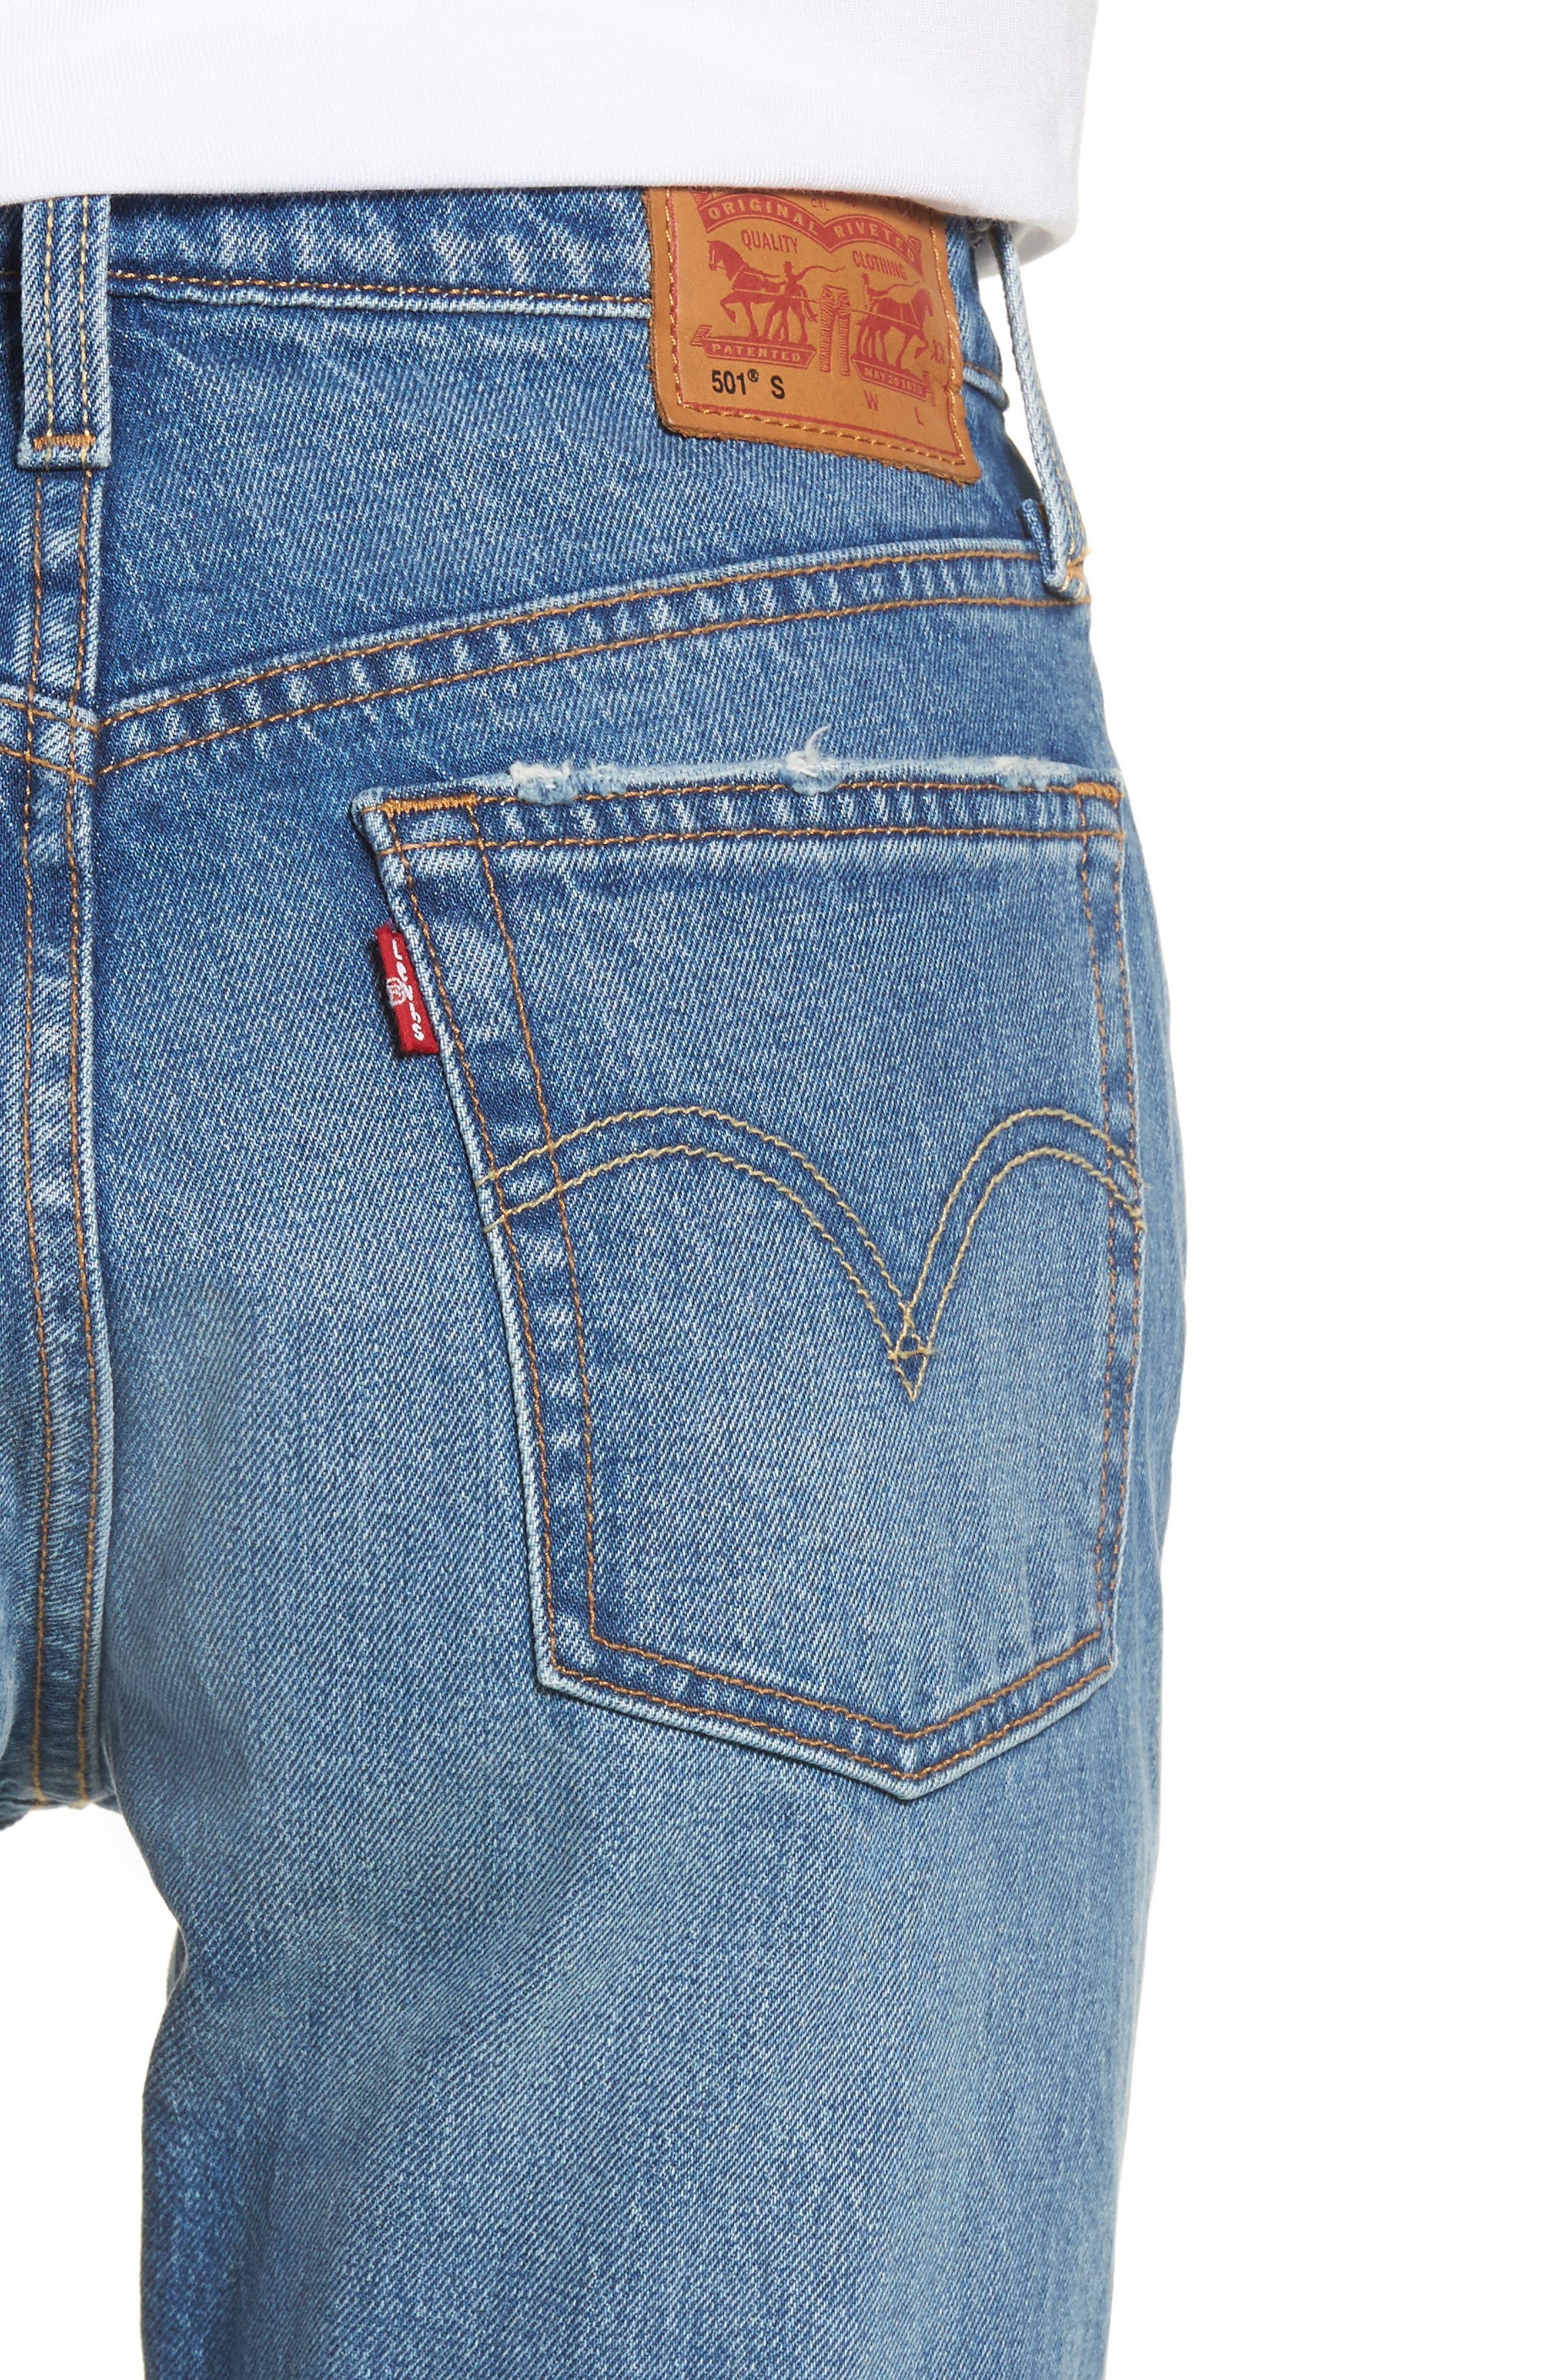 Alternate Image 4  - Levi's® 501 High Waist Skinny Jeans (Leave a Trace)